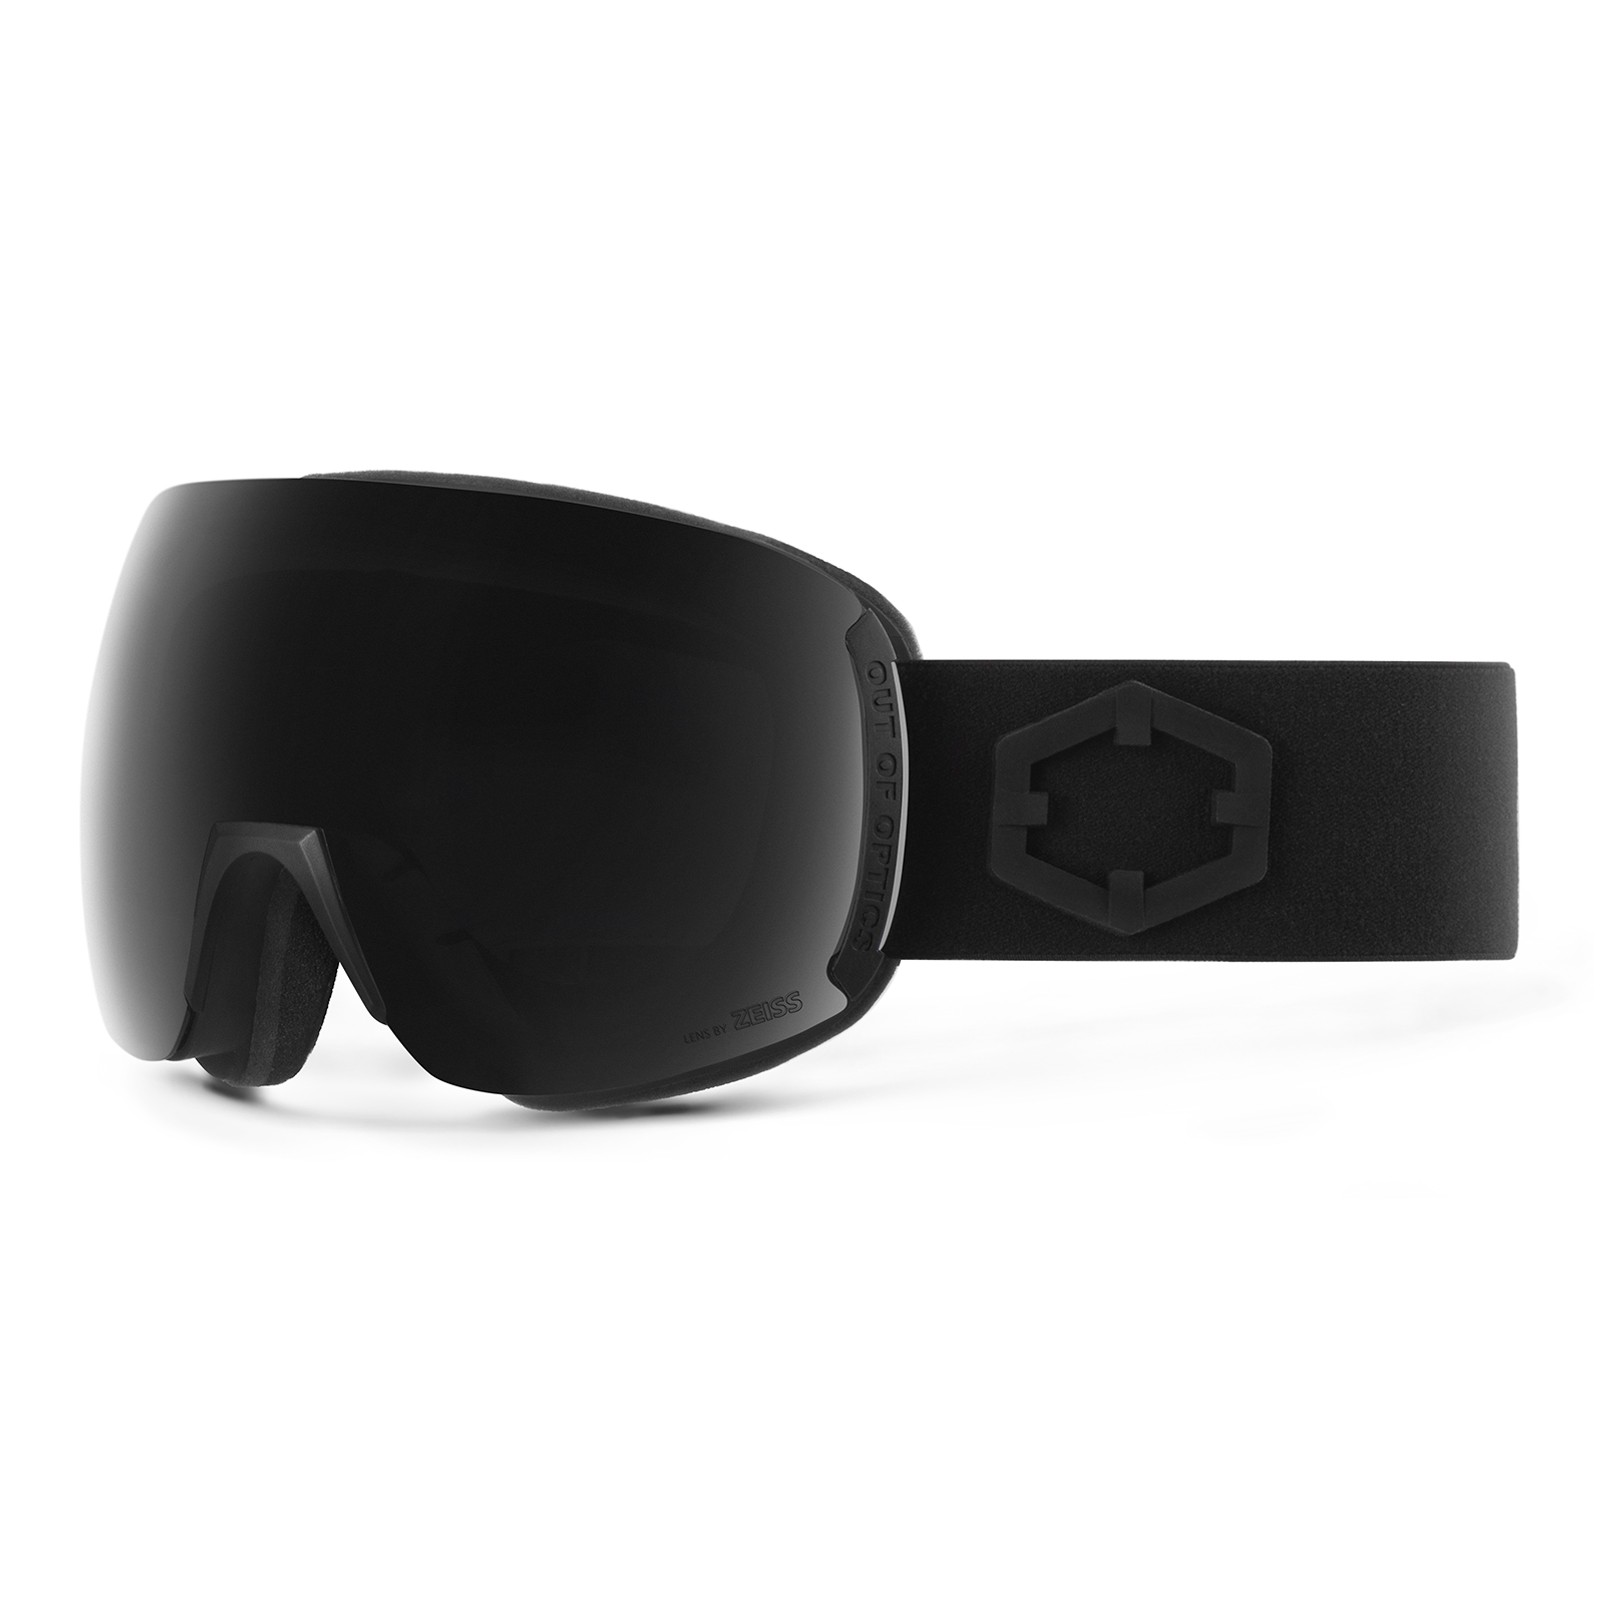 Earth Black Smoke goggle